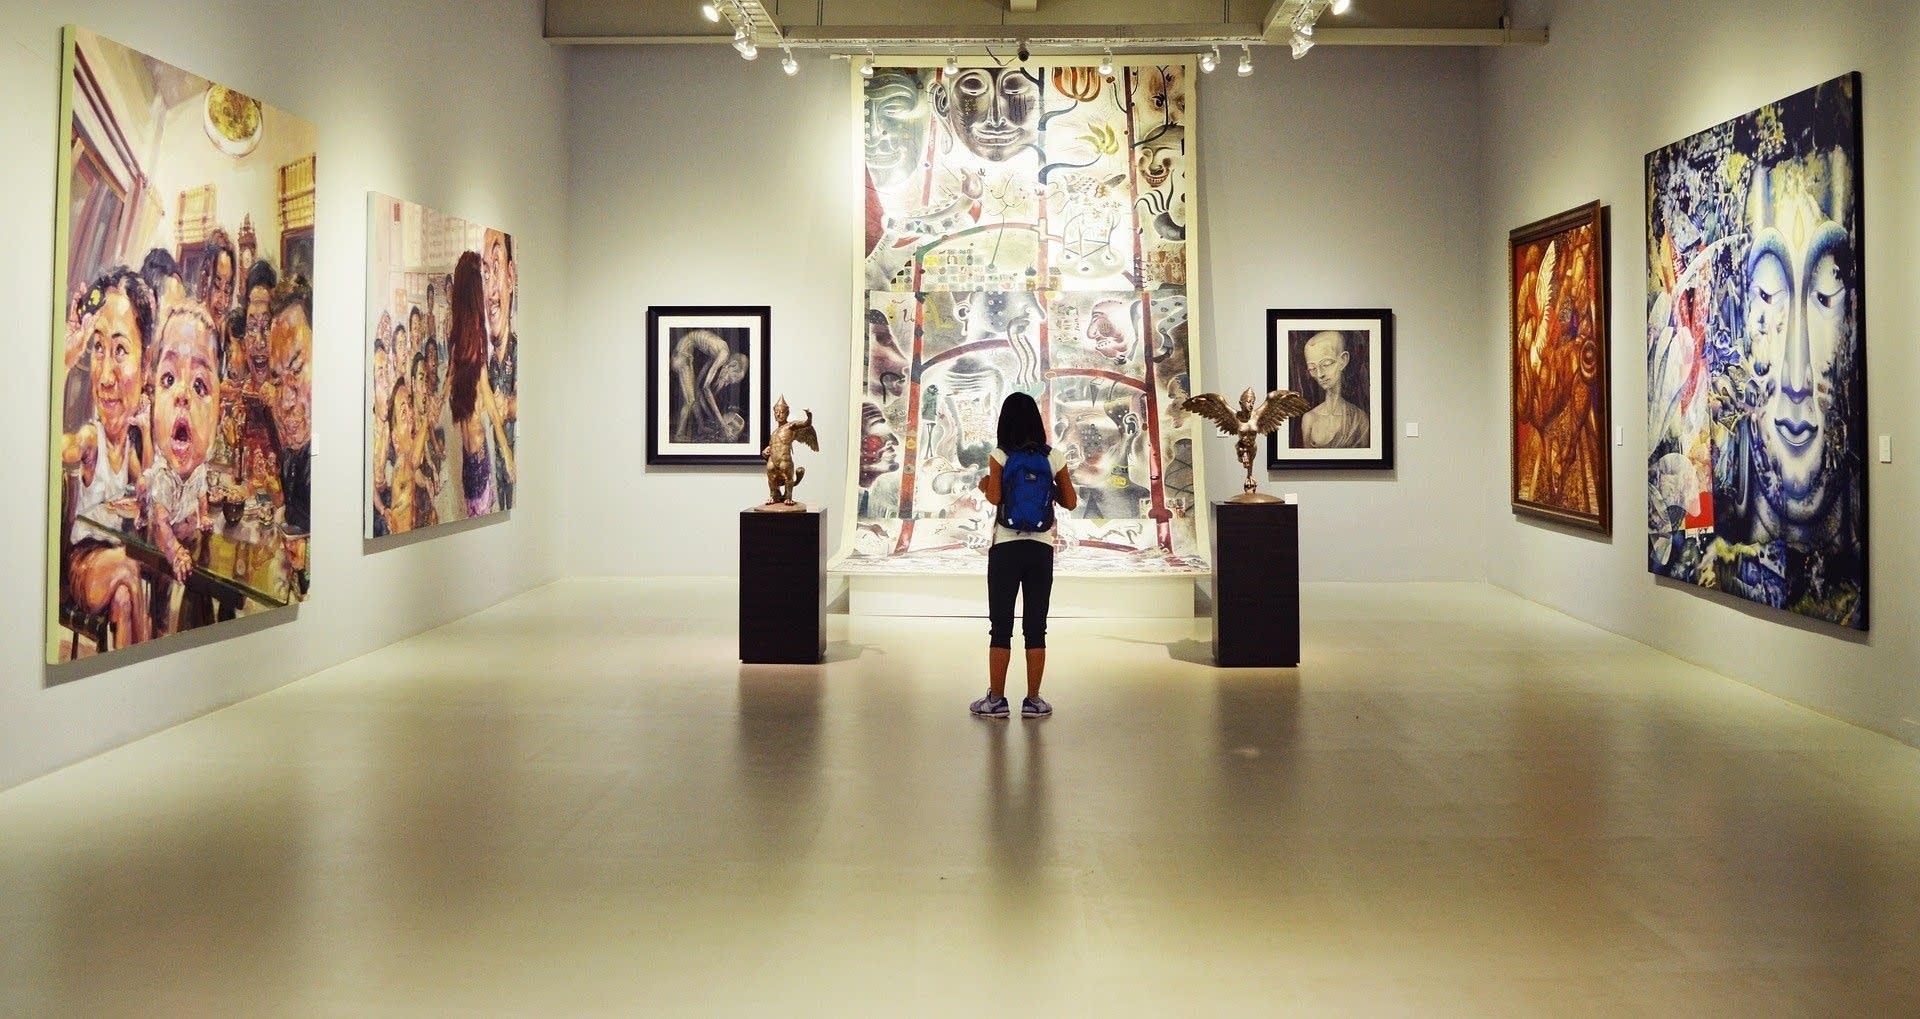 Museum art exhibition